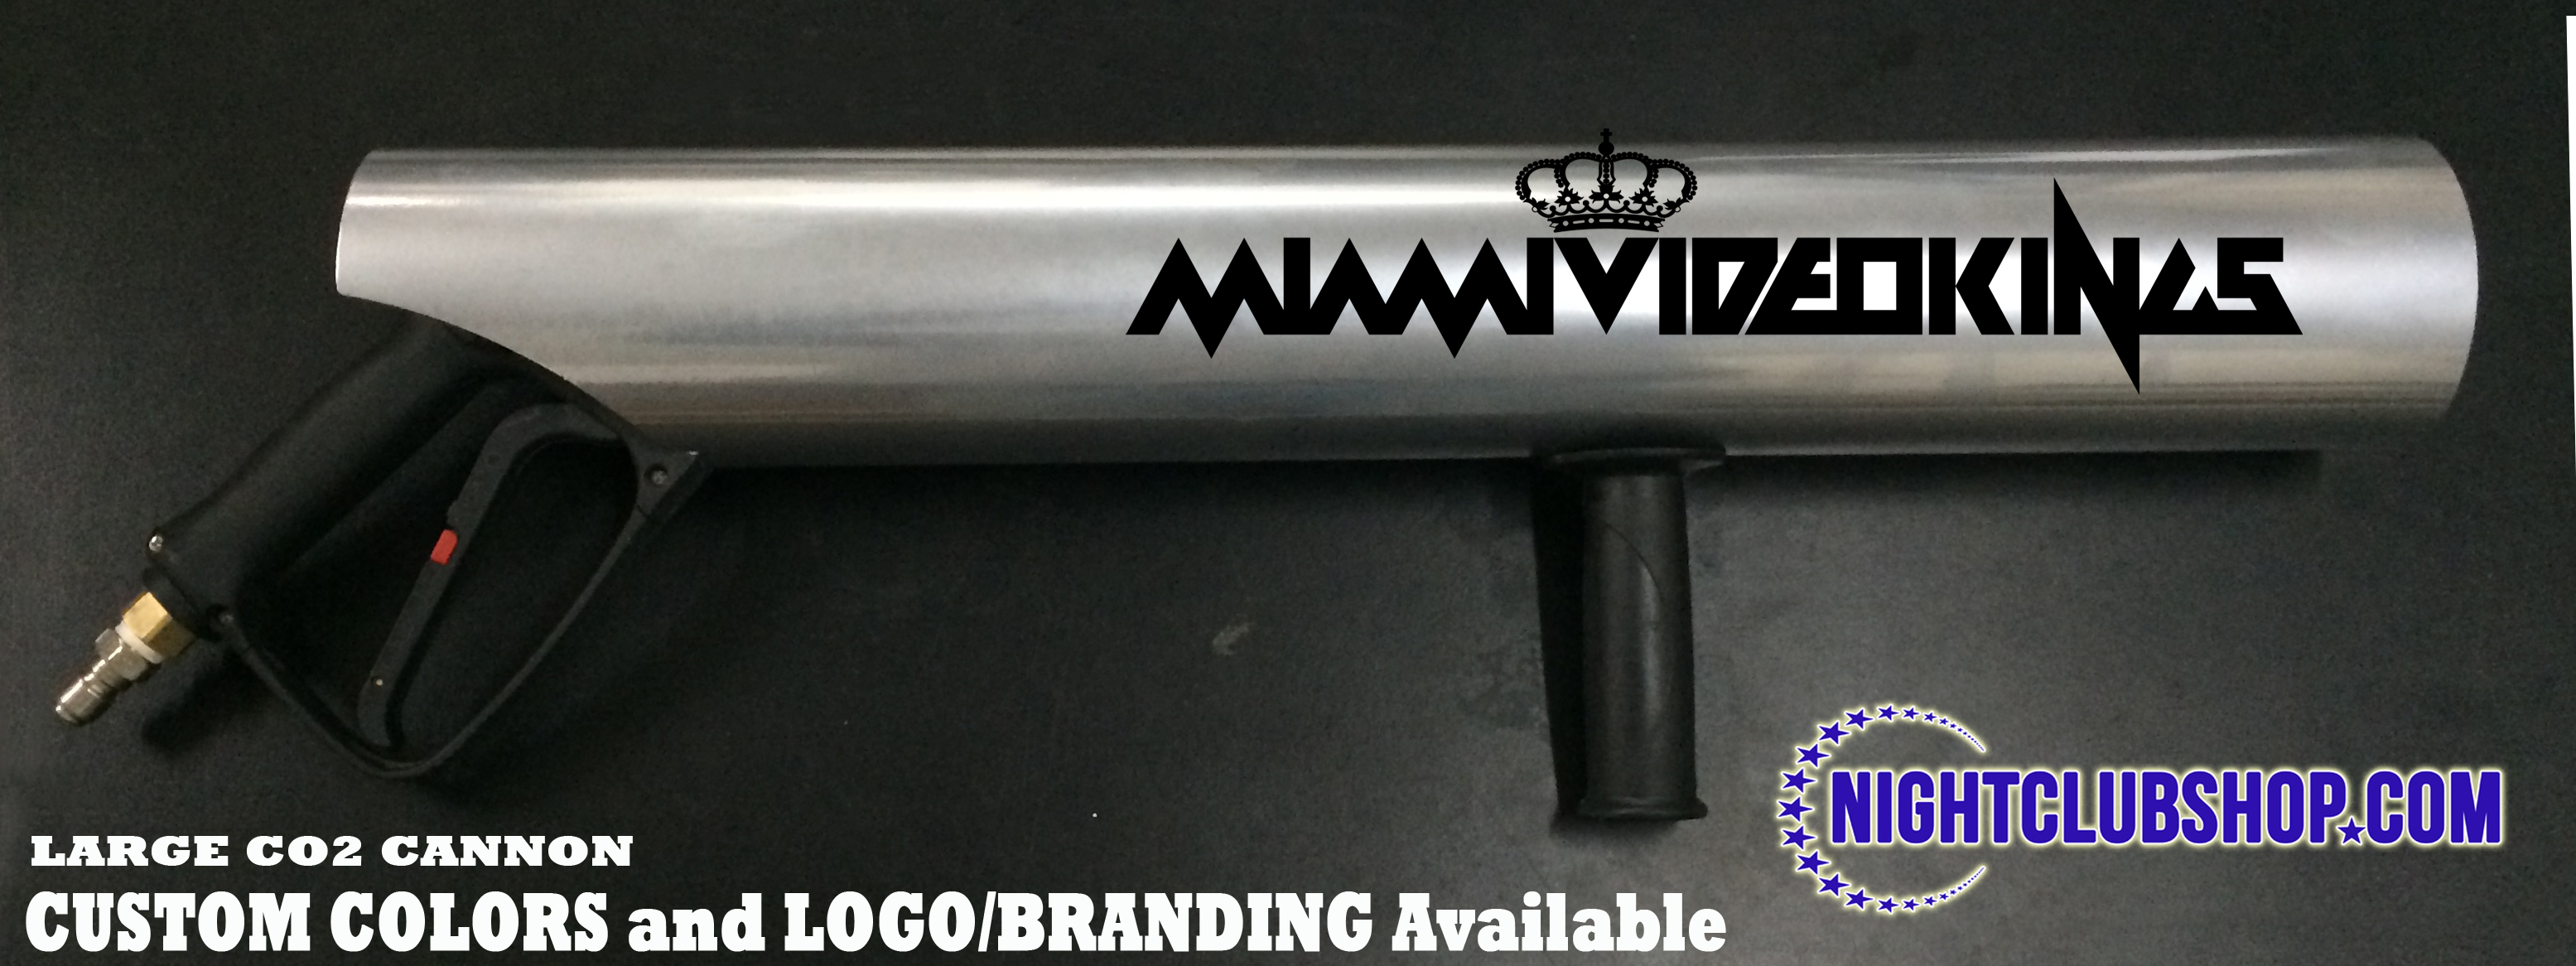 mvk-custom-painted-co2-cannon-cryo-gun.jpg